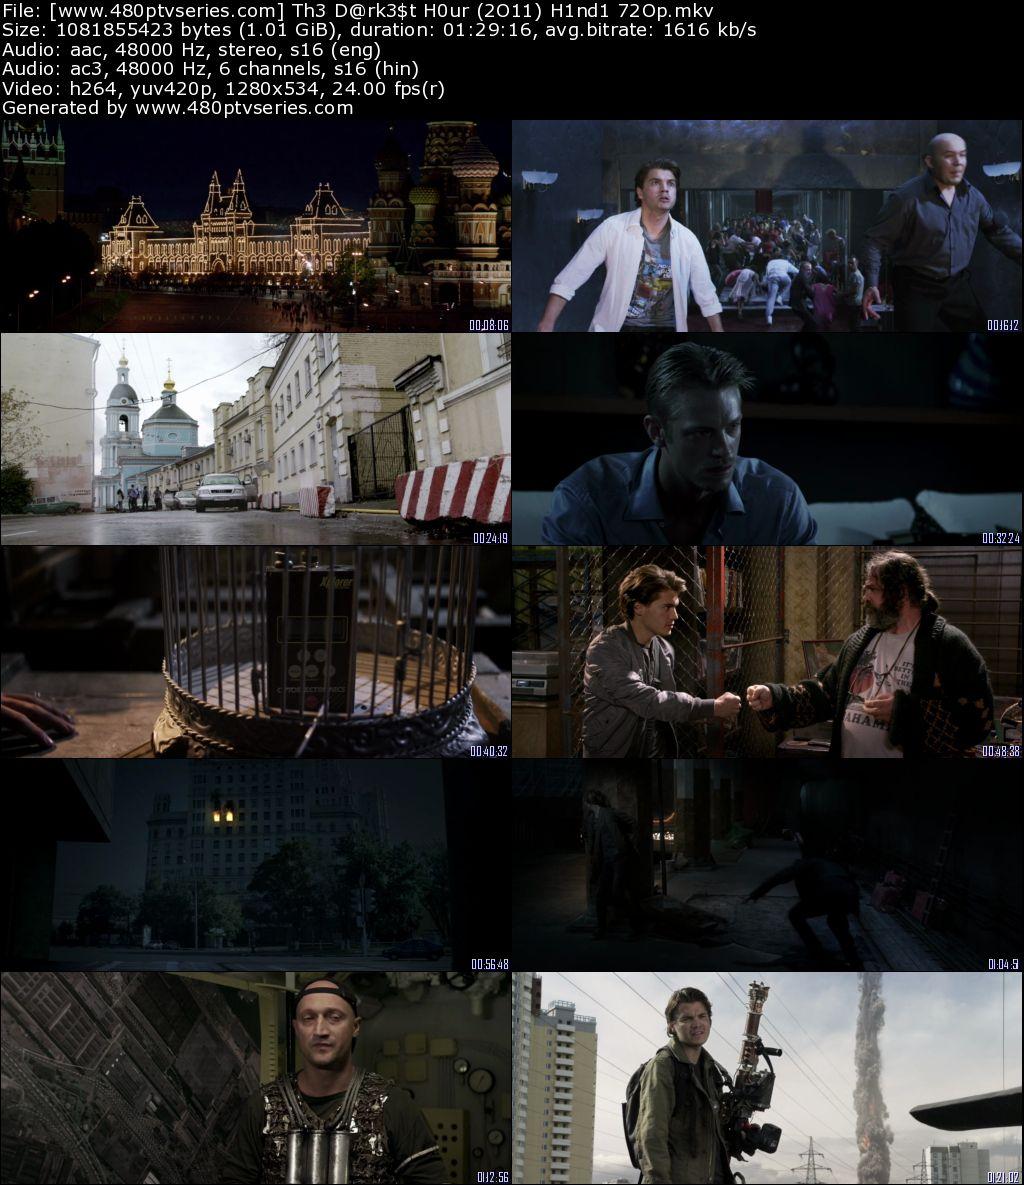 Download The Darkest Hour (2011) Full Movie Hindi Dual Audio Download 720p Bluray Free Watch Online Full Movie Download Worldfree4u 9xmovies